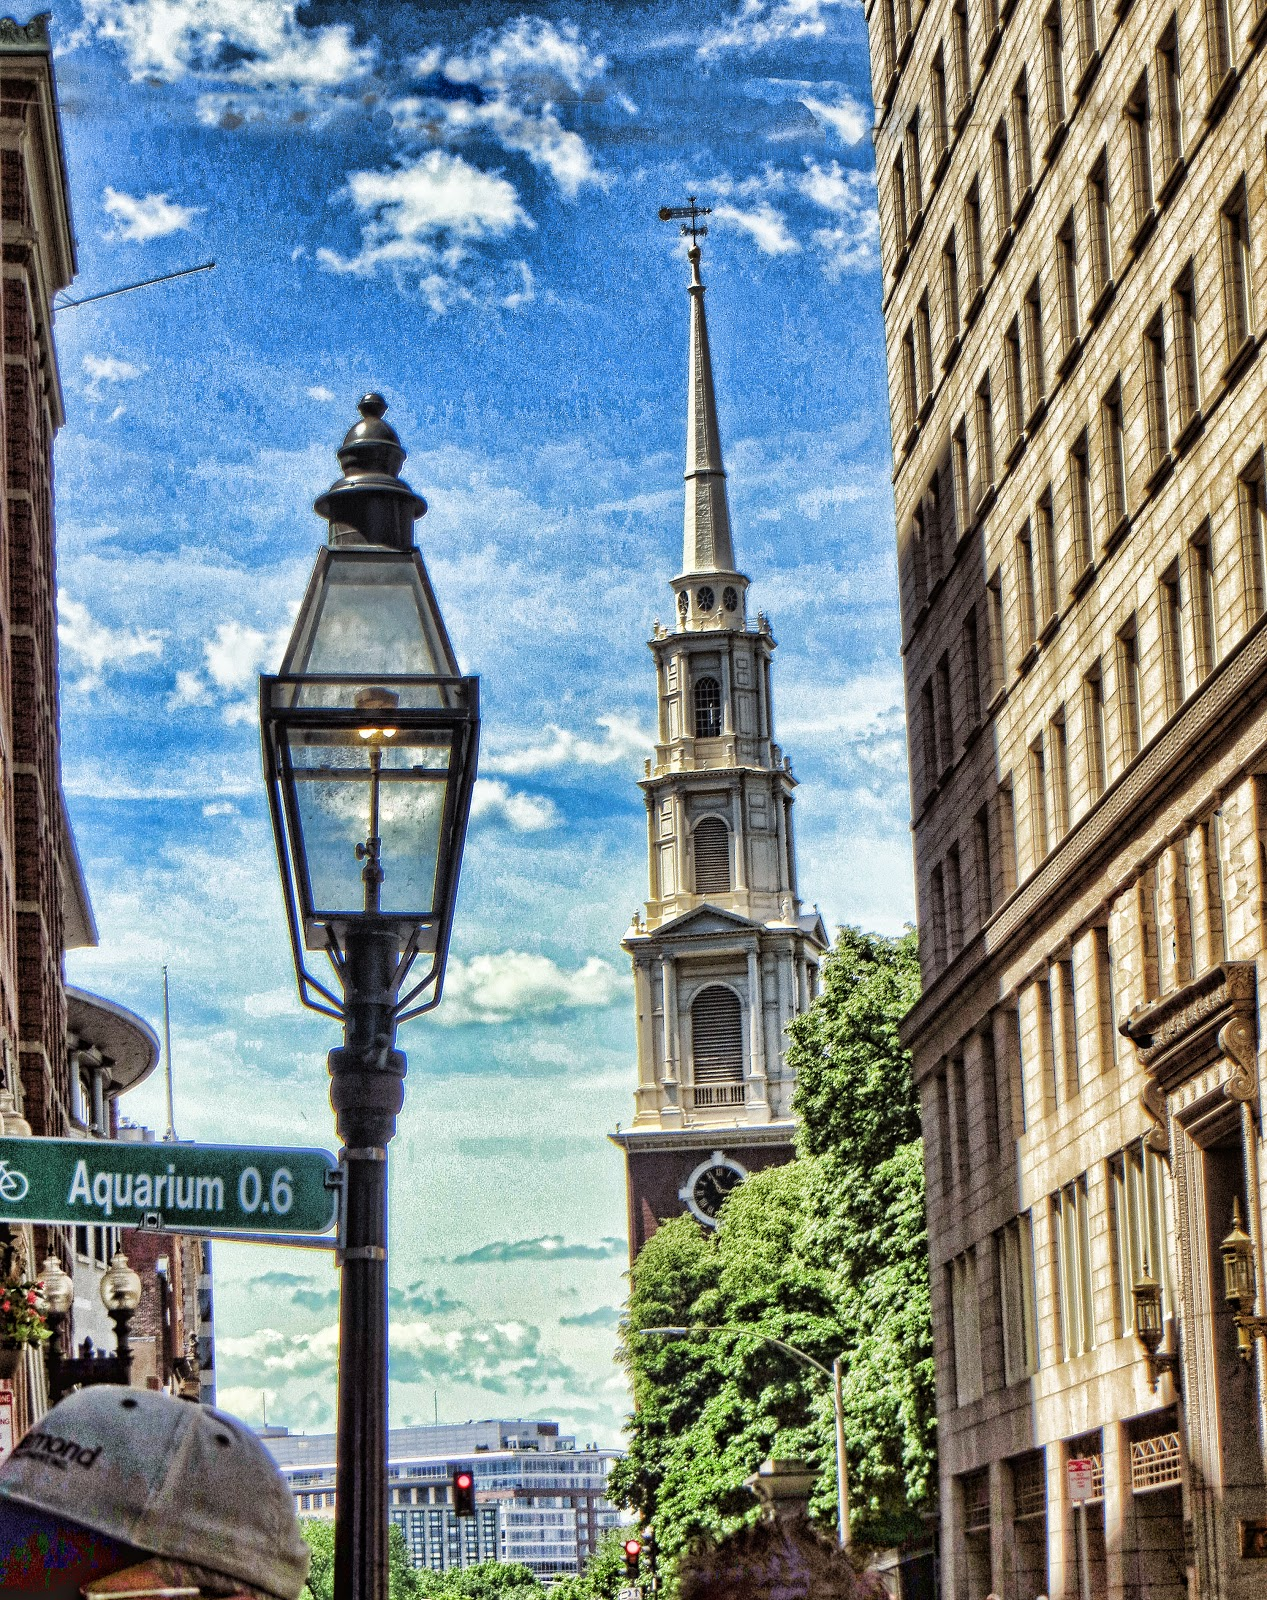 self guide walking tour in boston